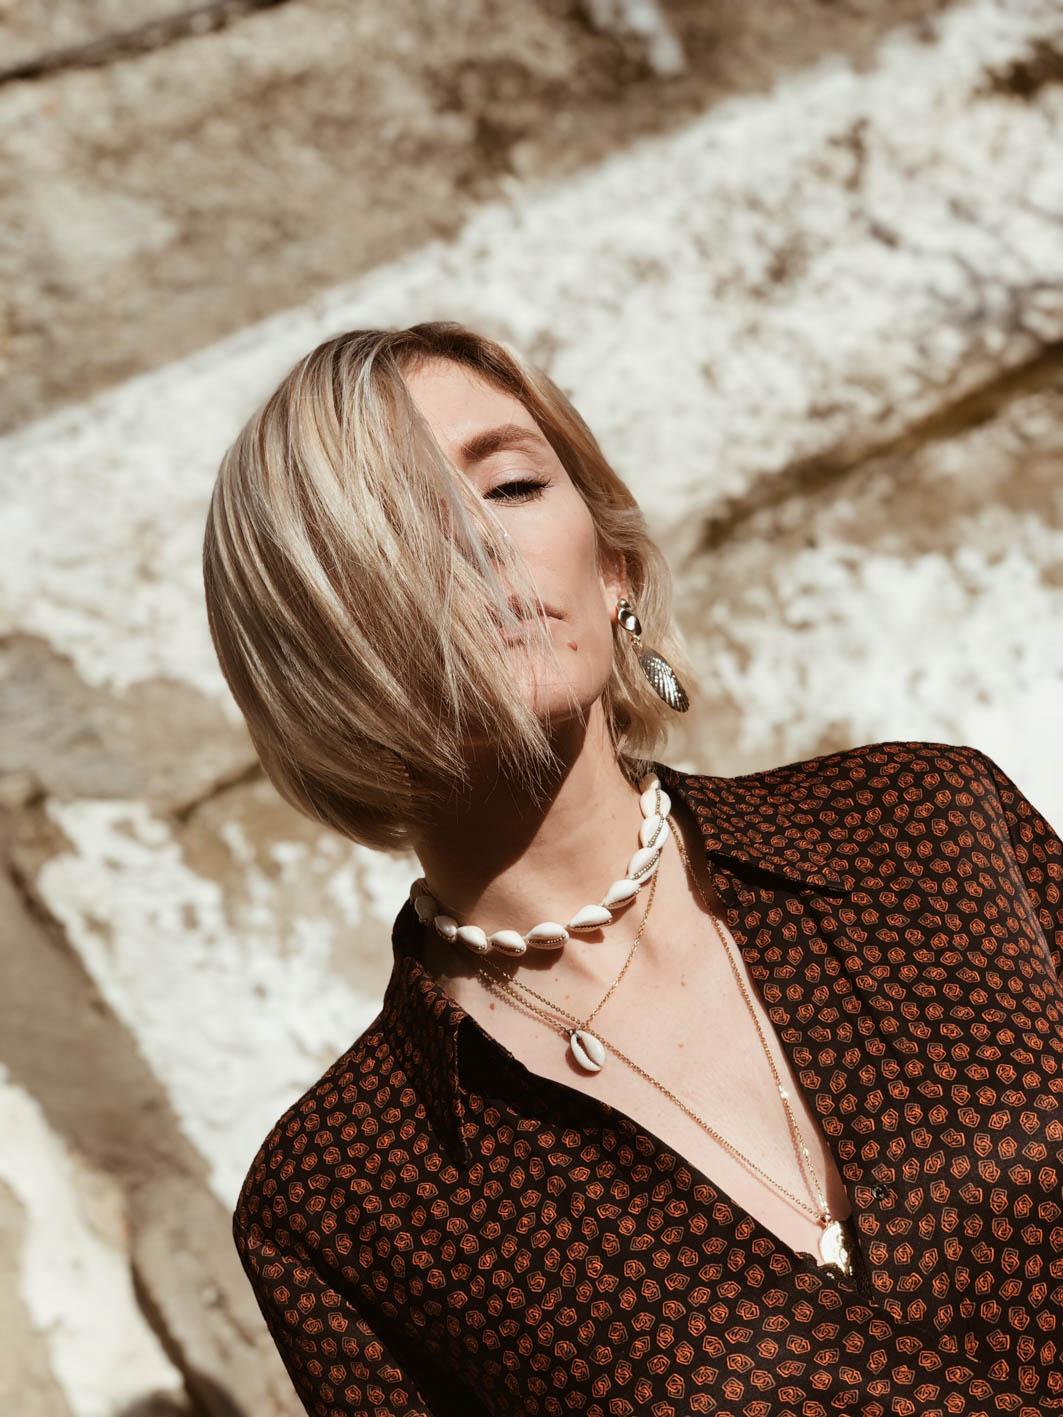 Carnet sauvage- blog mode et tendances - Bijoux coquillages1.jpg